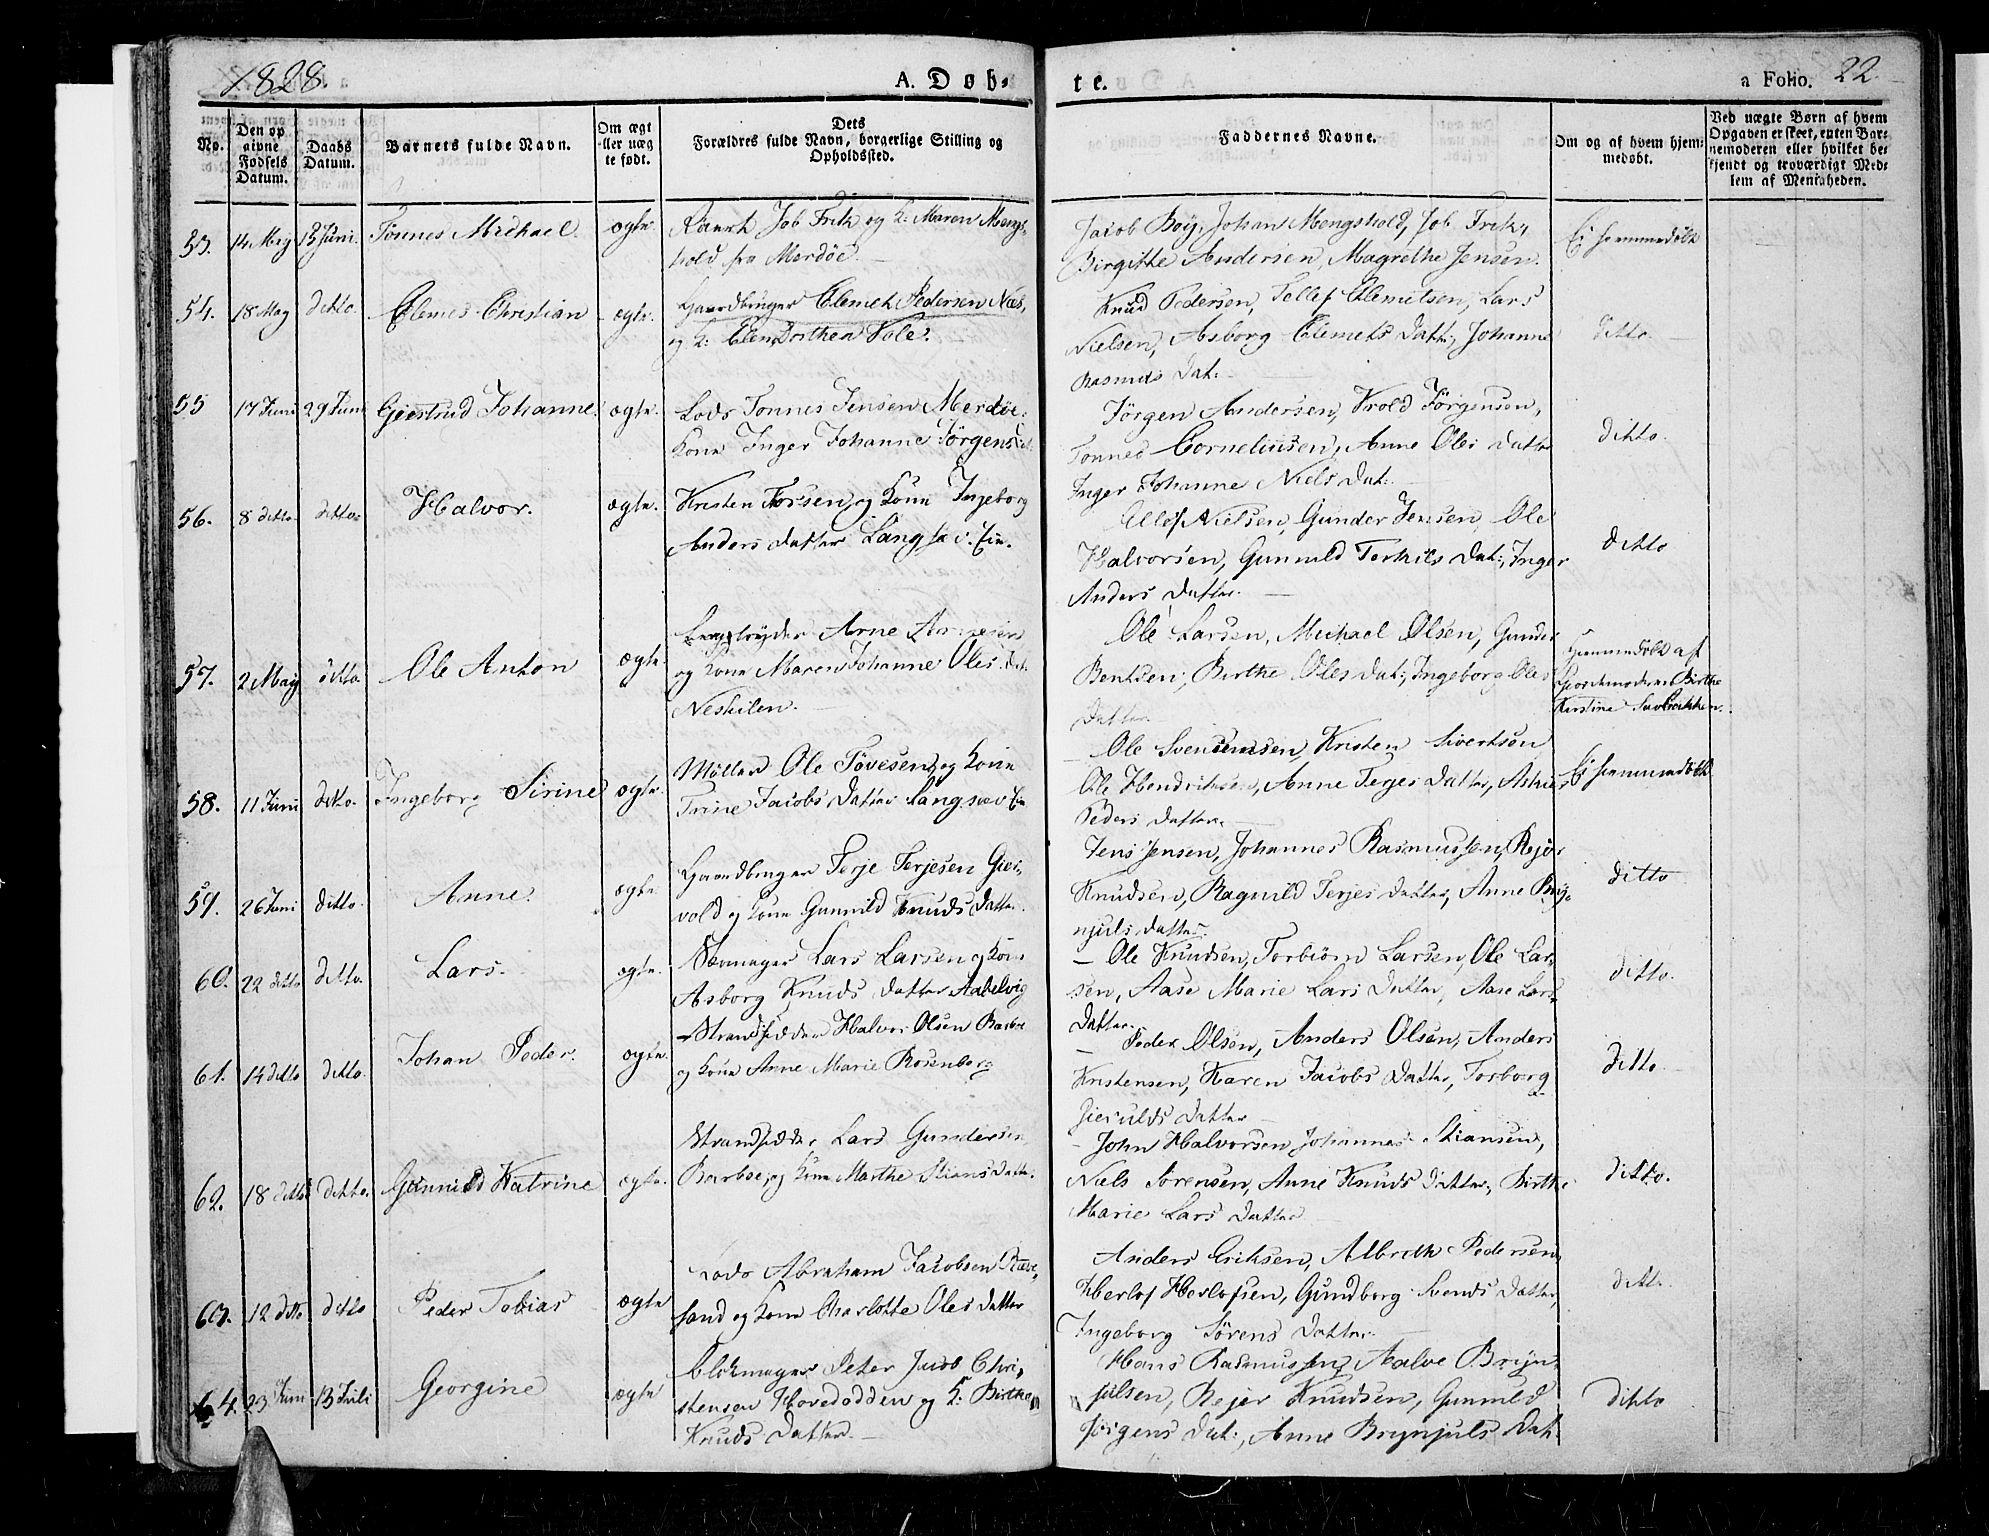 SAK, Tromøy sokneprestkontor, F/Fa/L0003: Ministerialbok nr. A 3, 1825-1837, s. 22